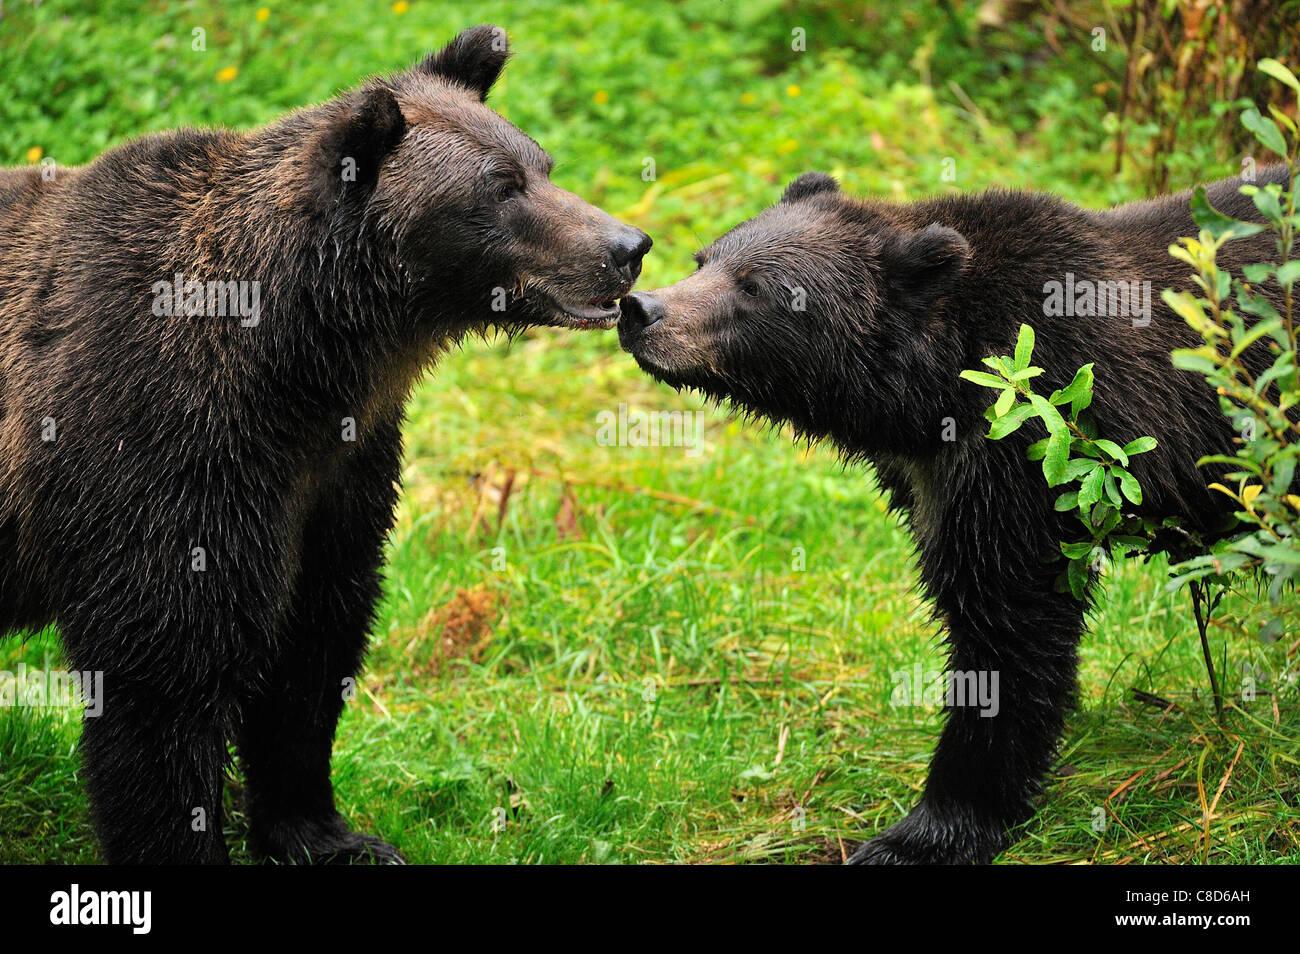 Mutter und Jungtier Grizzlybären. Stockbild